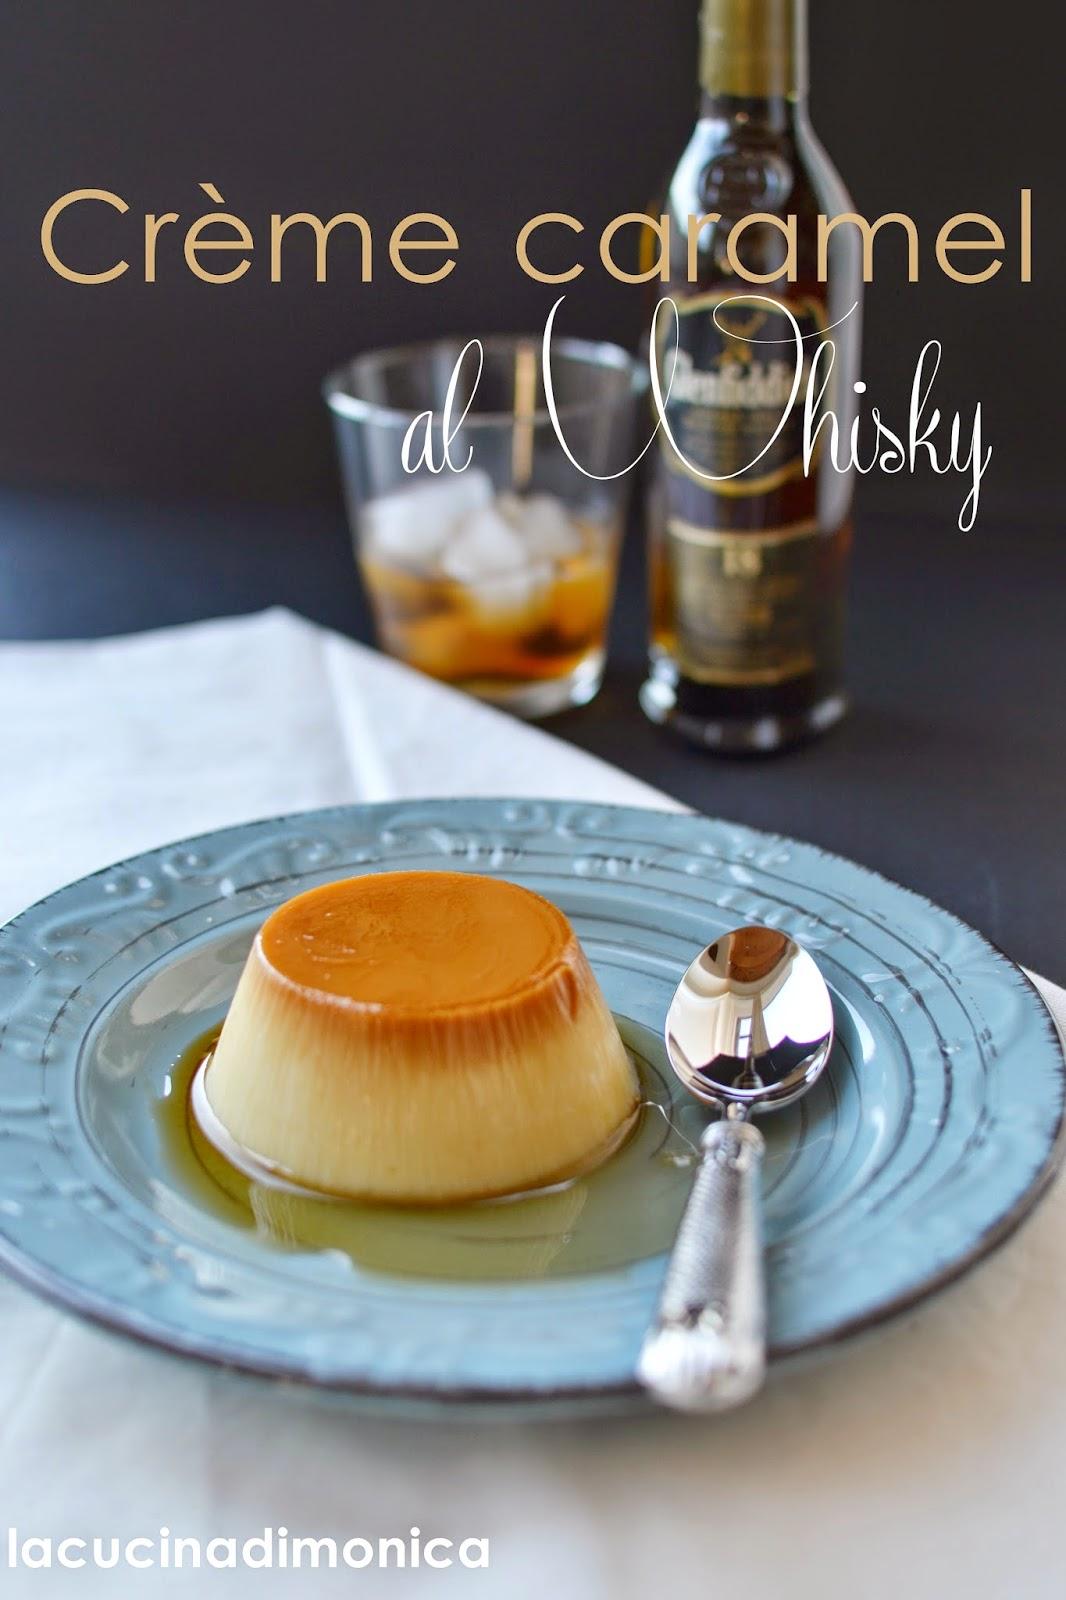 crème caramel al whisky